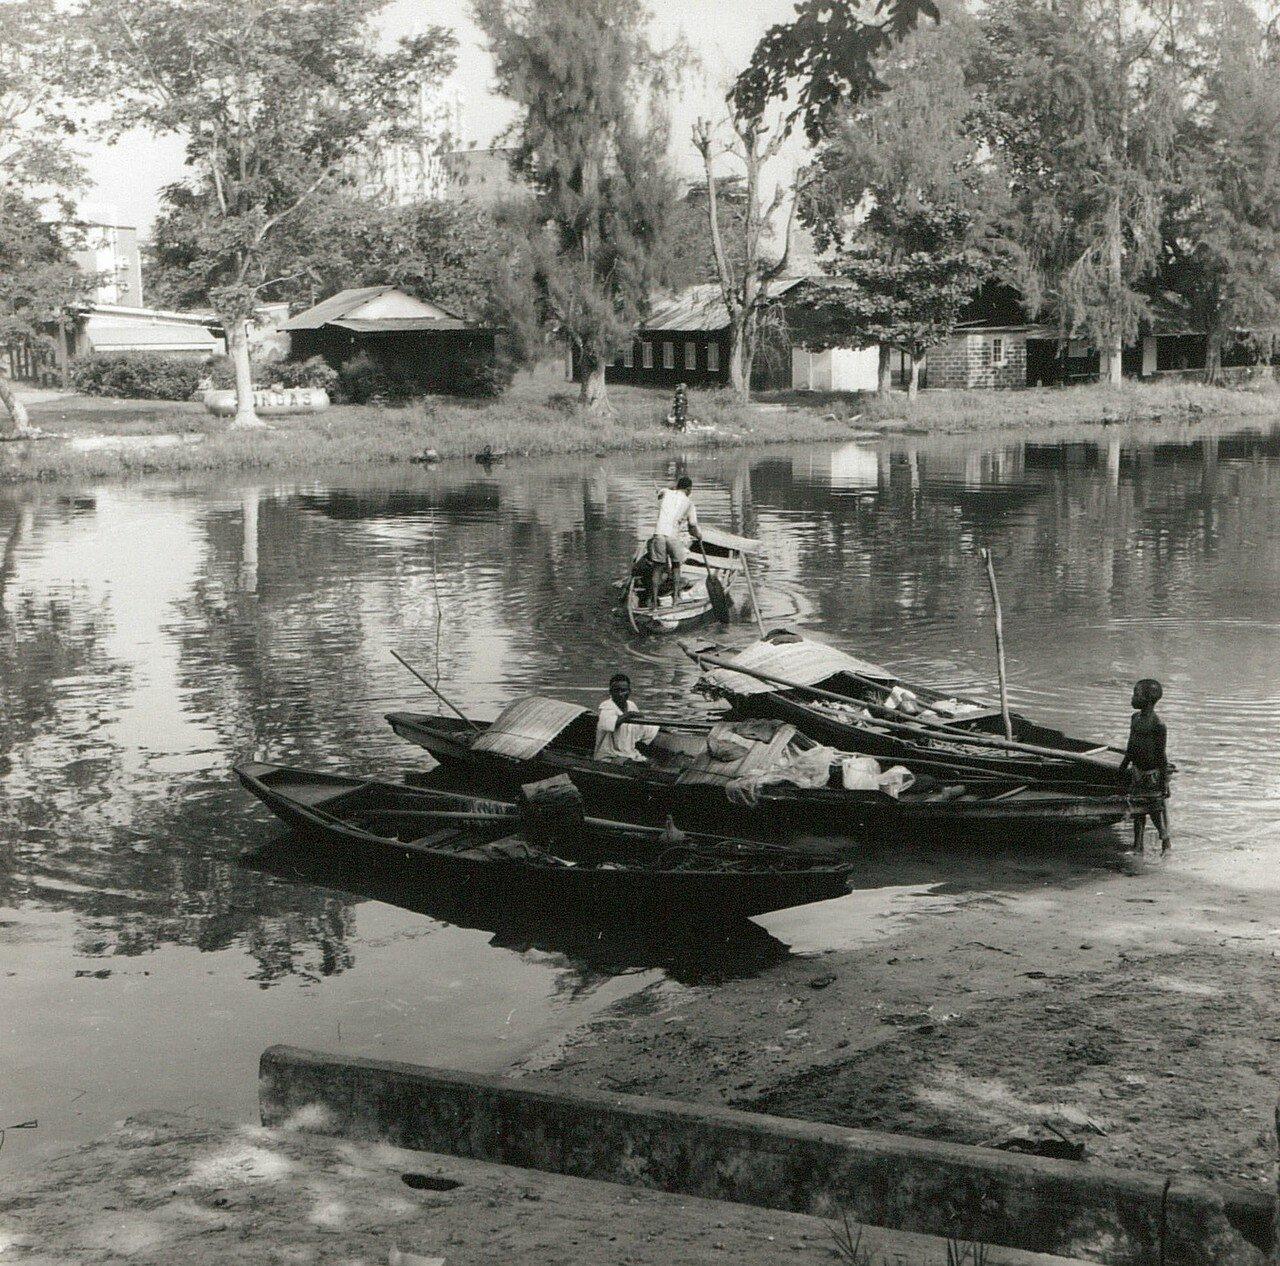 Лагуна Лагоса.  Рыбацкие деревушки